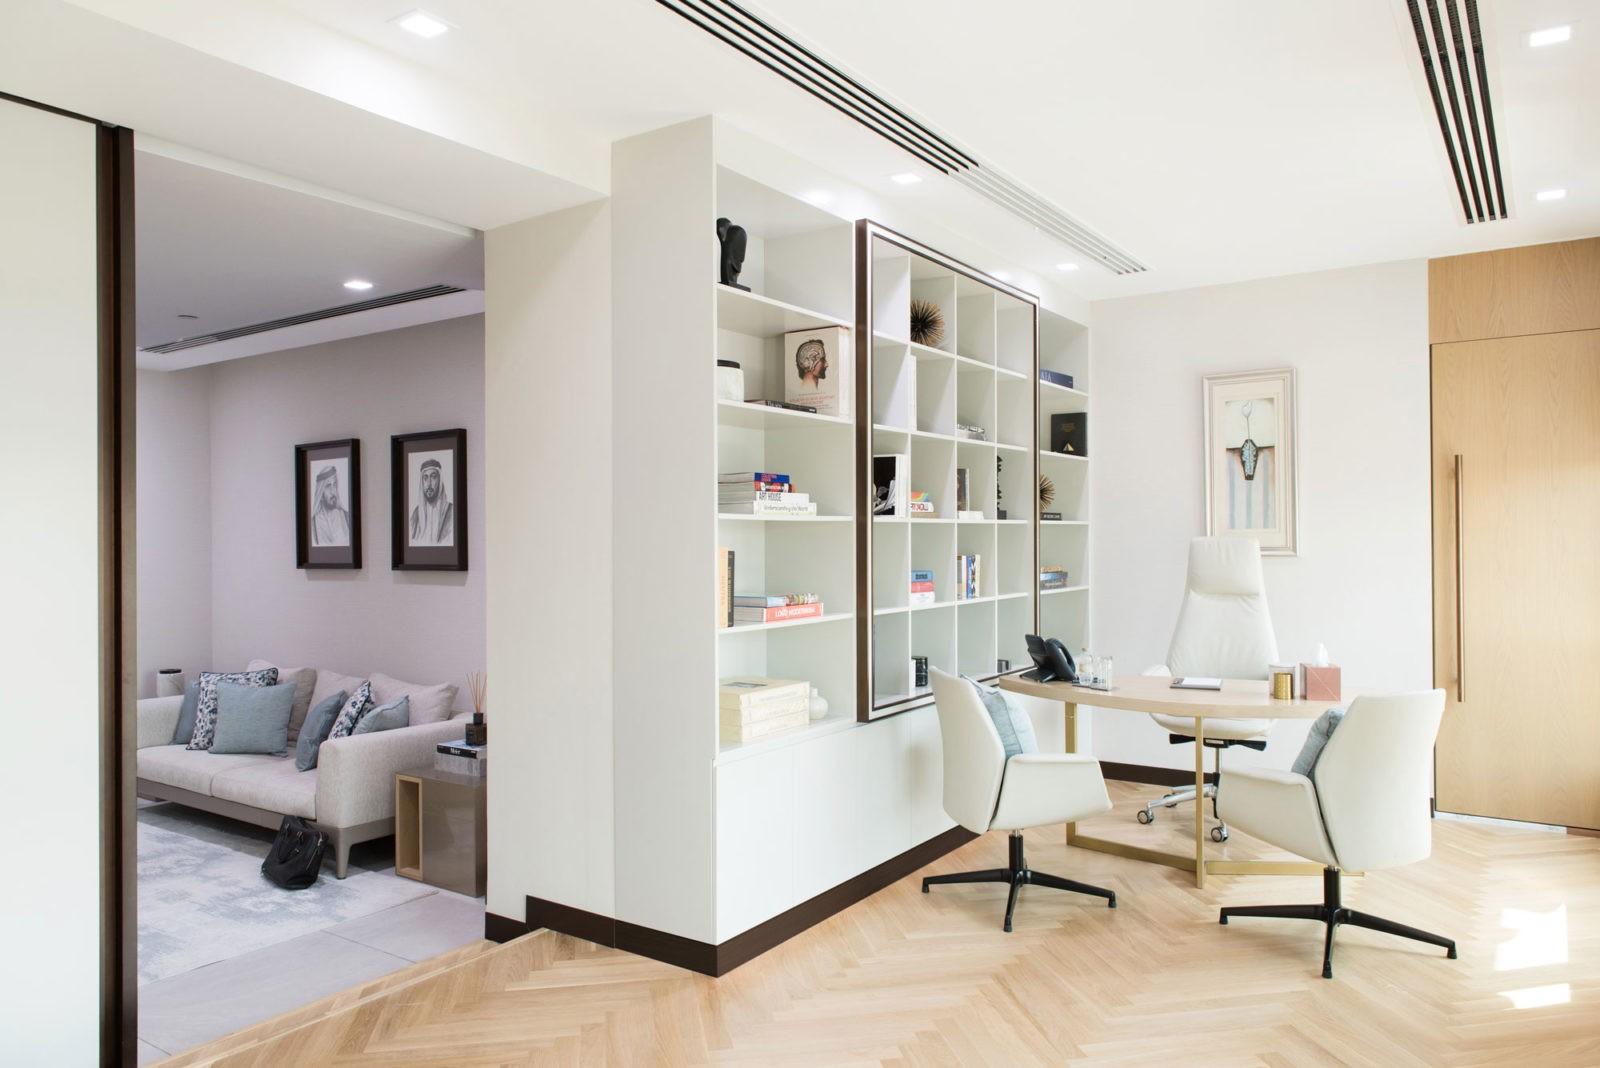 Dubai Holding Chairman Office - Sneha Divias Atelier